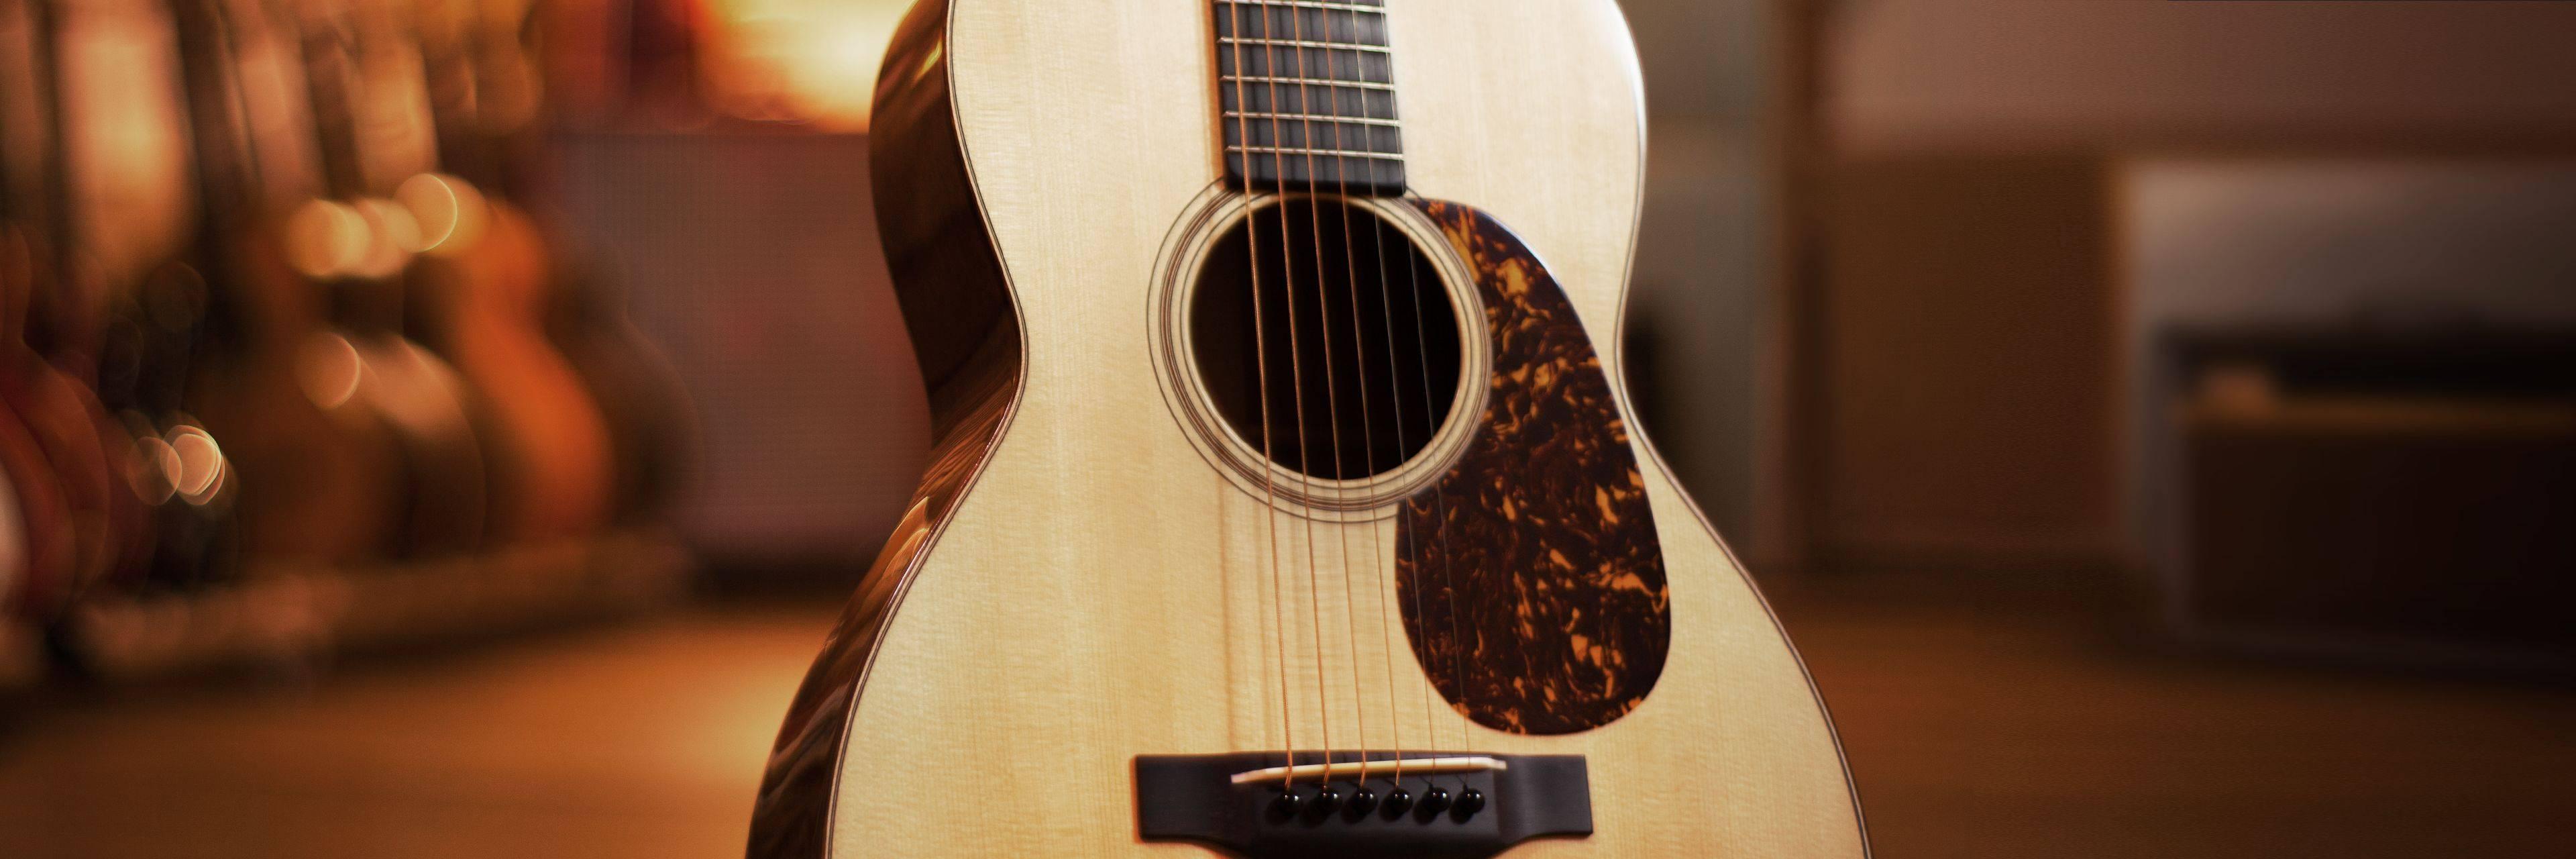 玩转 NI 最新木吉他音源 Picked Acoustic